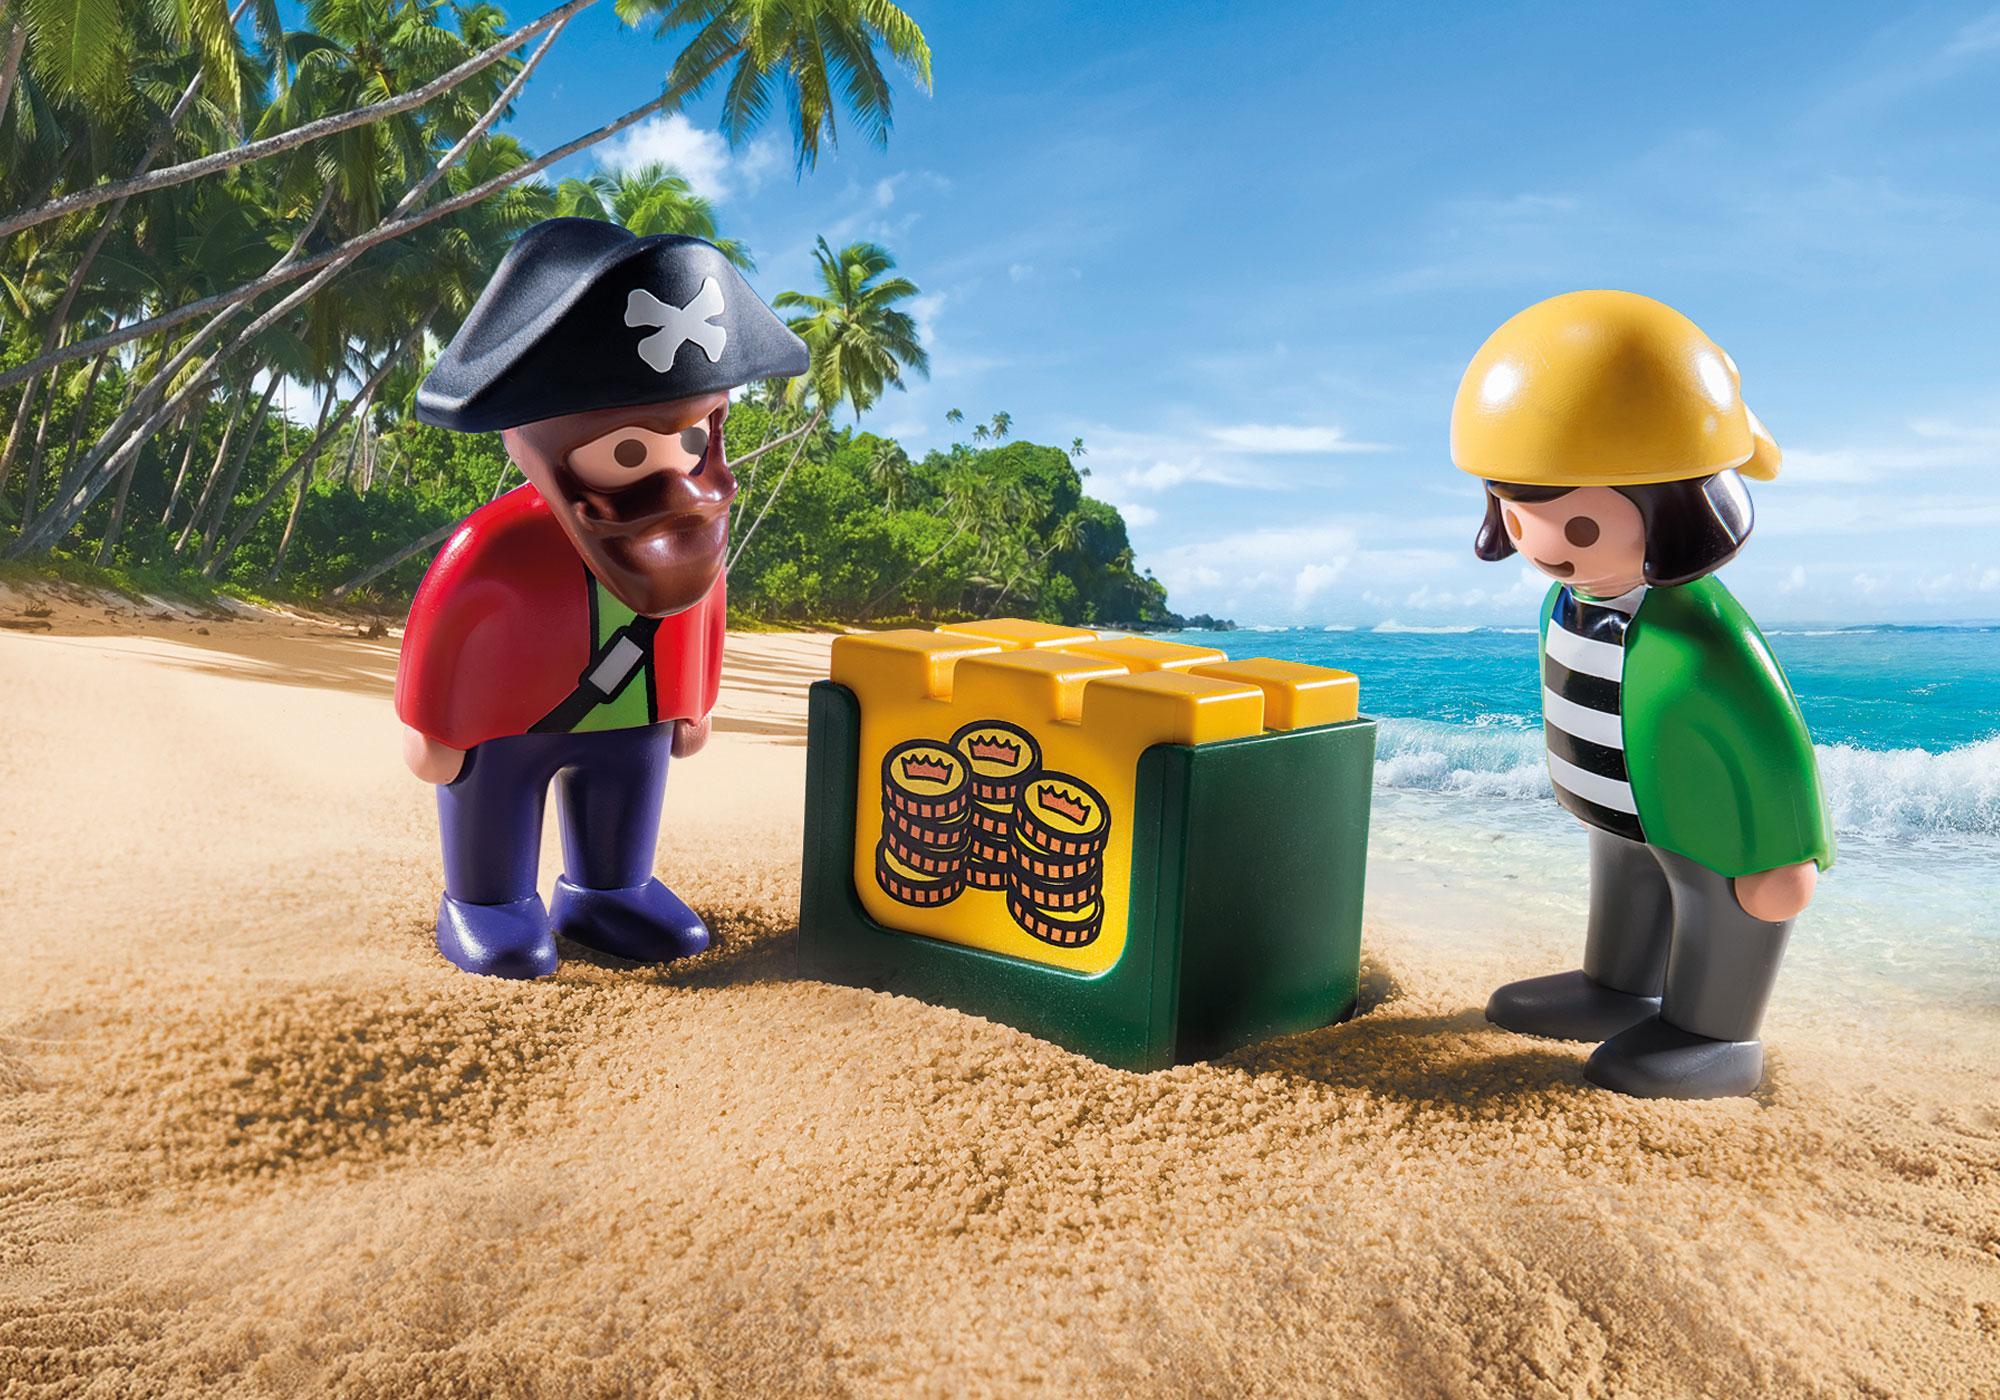 http://media.playmobil.com/i/playmobil/9118_product_extra1/Piratenschiff